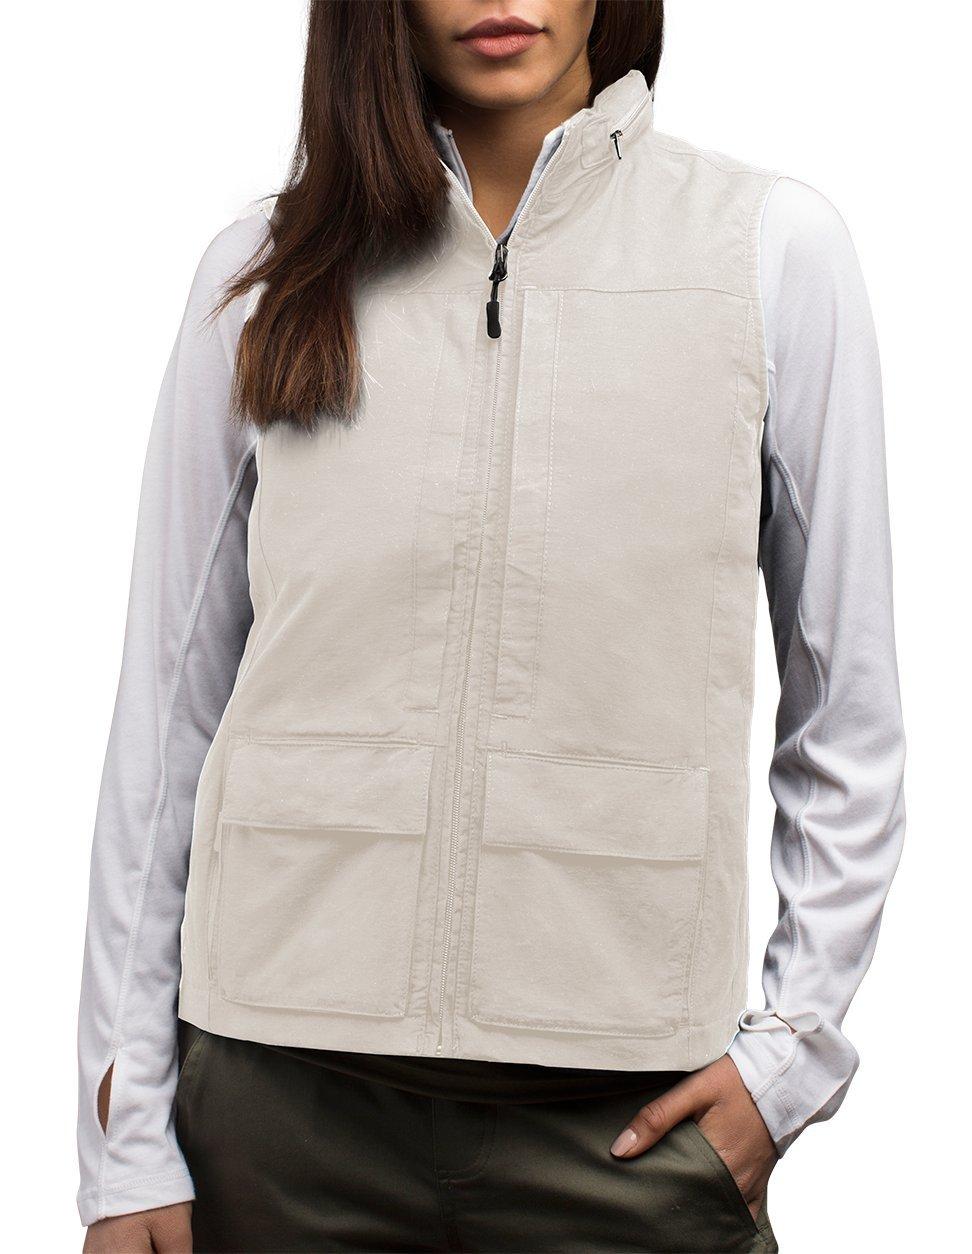 SCOTTeVEST Women's Q.U.E.S.T. Vest - 42 Pockets – Photography, Travel Vest (Large, Beige) by SCOTTeVEST